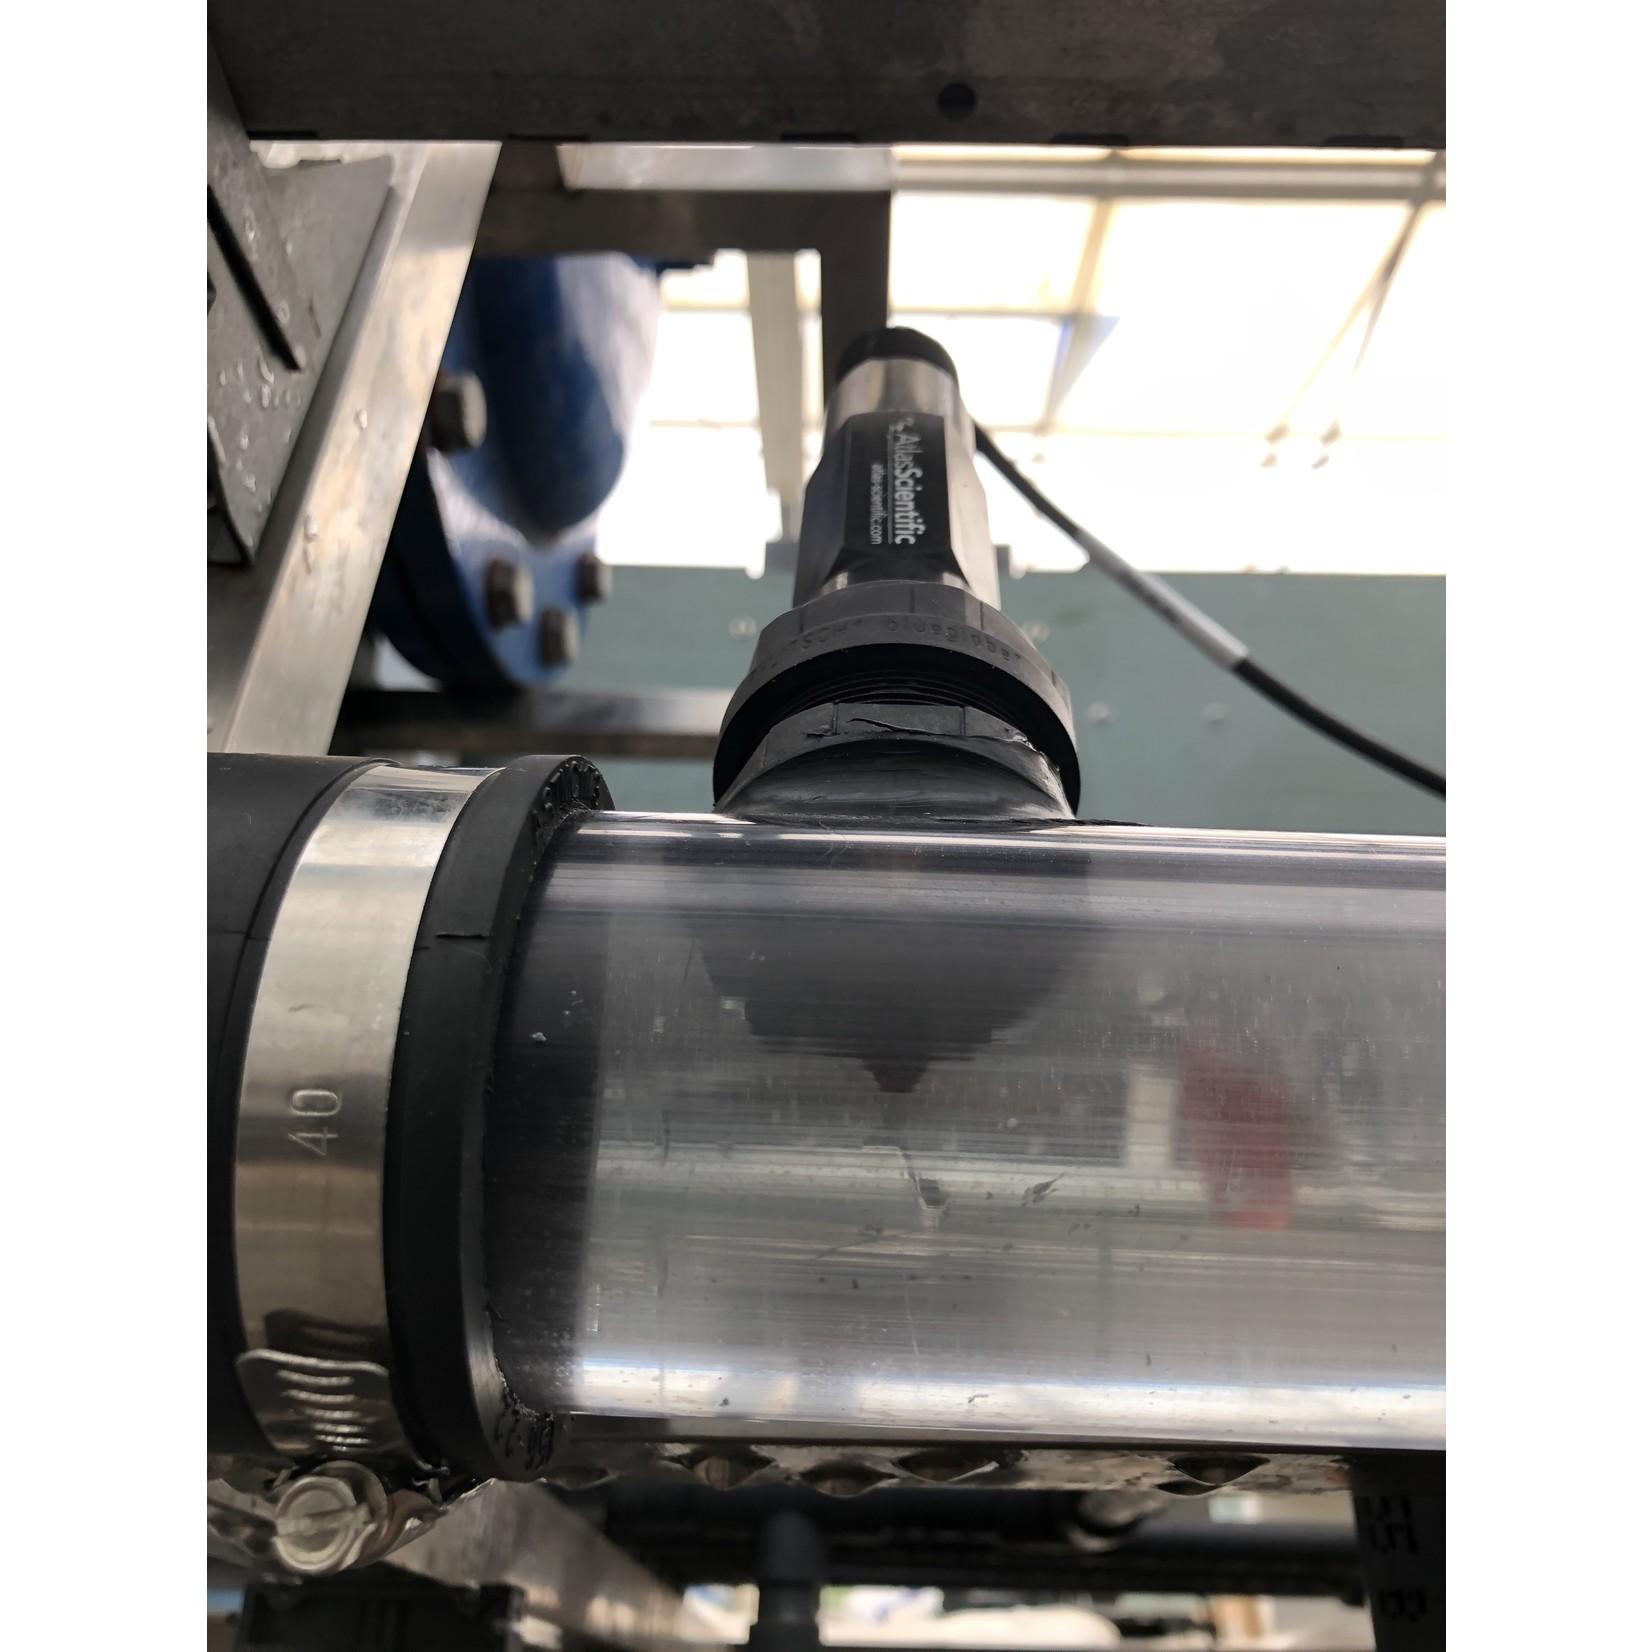 Robesol Sensor wartel M-25